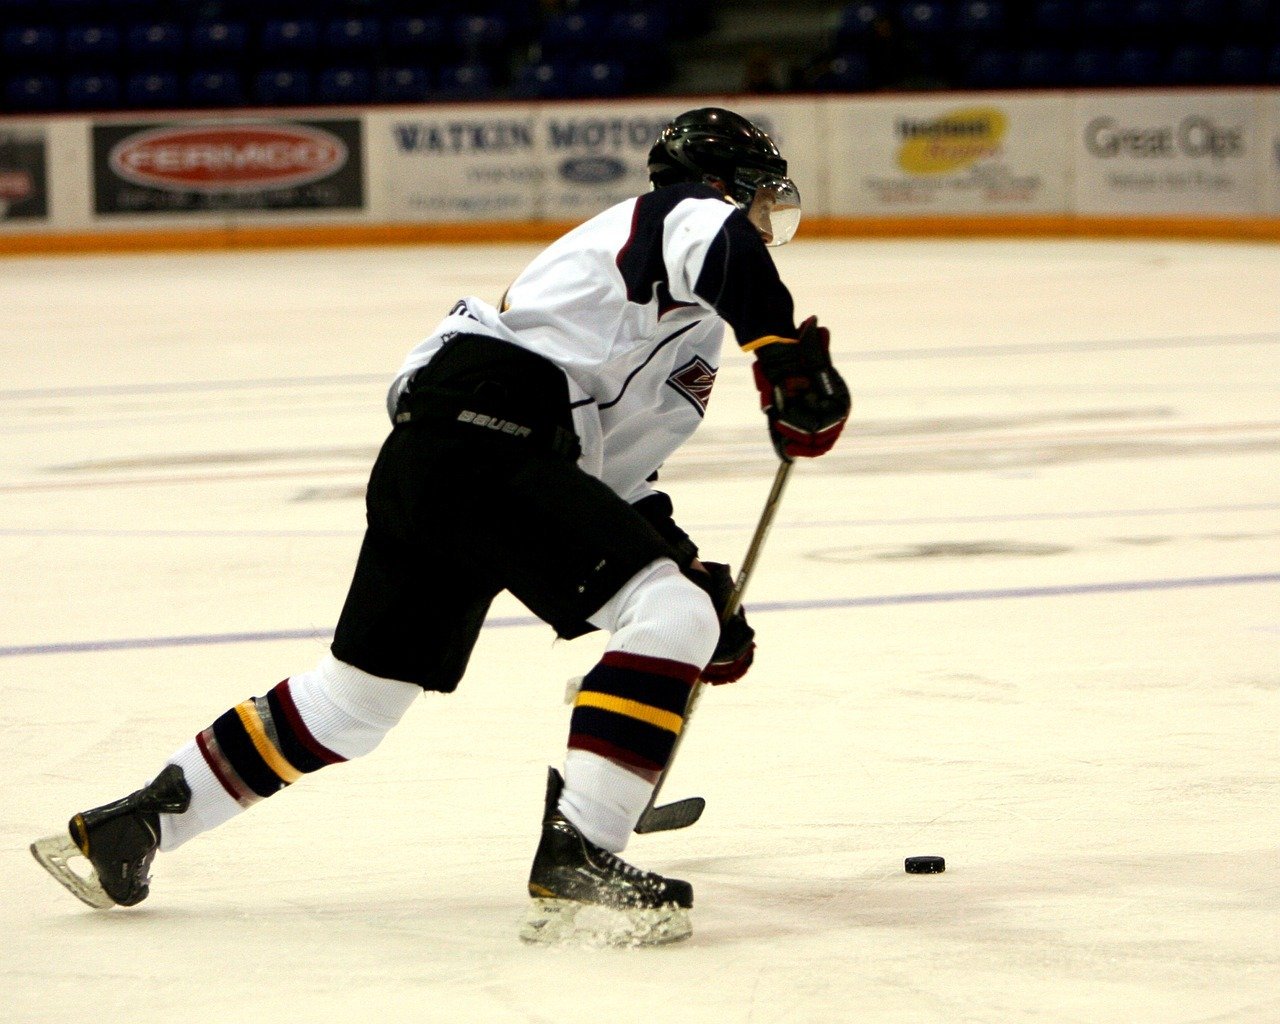 musculation et muscle sollicites hockey sur glace